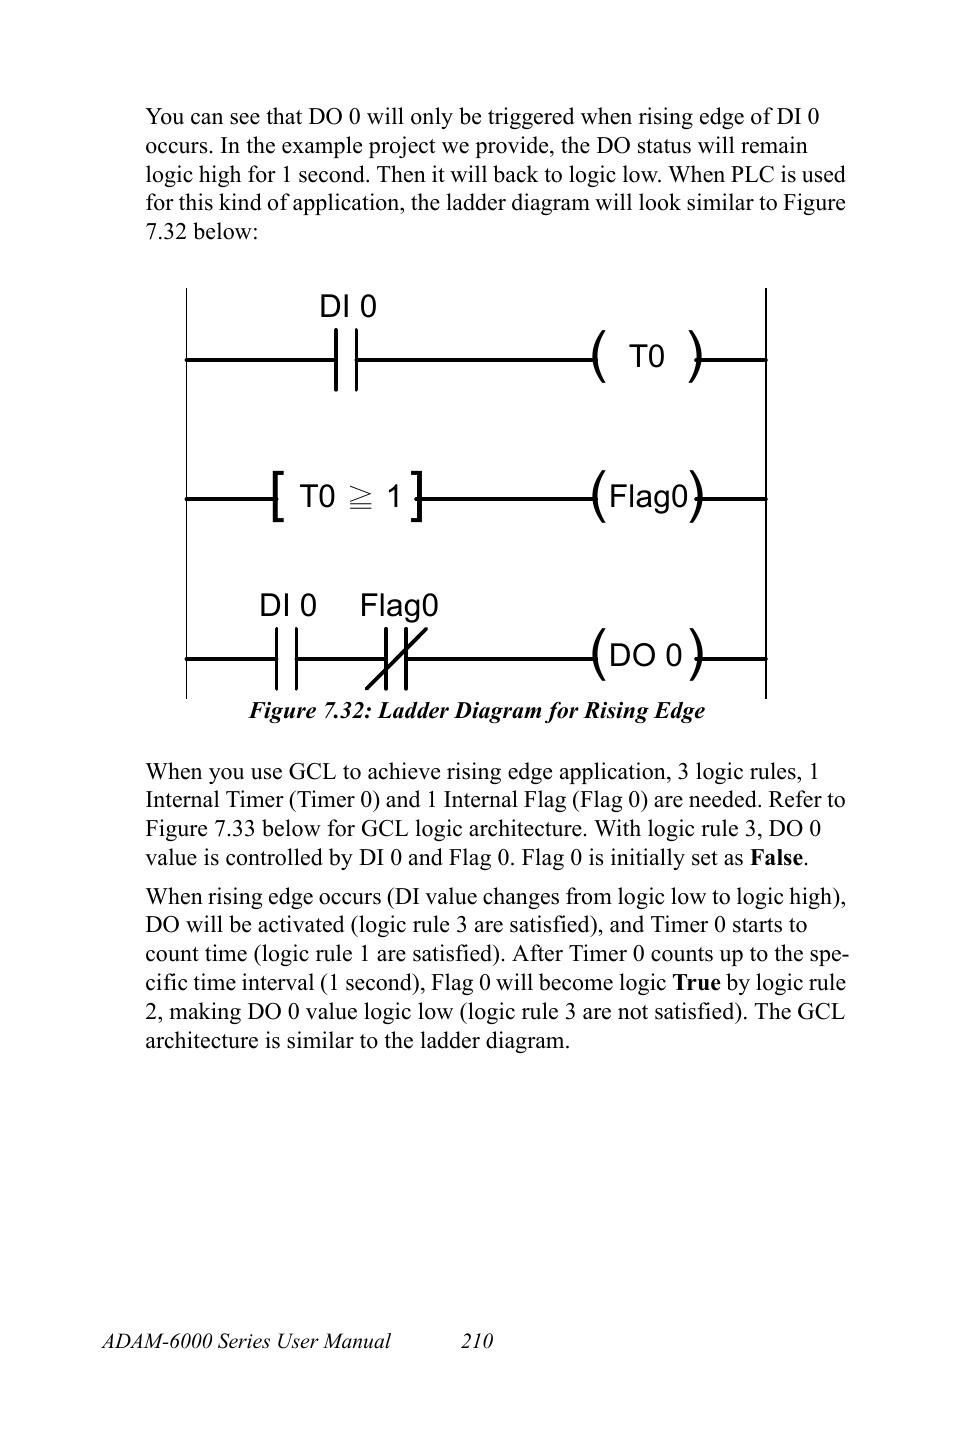 Figure 732 ladder diagram for rising edge figure 732ladder figure 732 ladder diagram for rising edge figure 732ladder diagram for rising ccuart Images